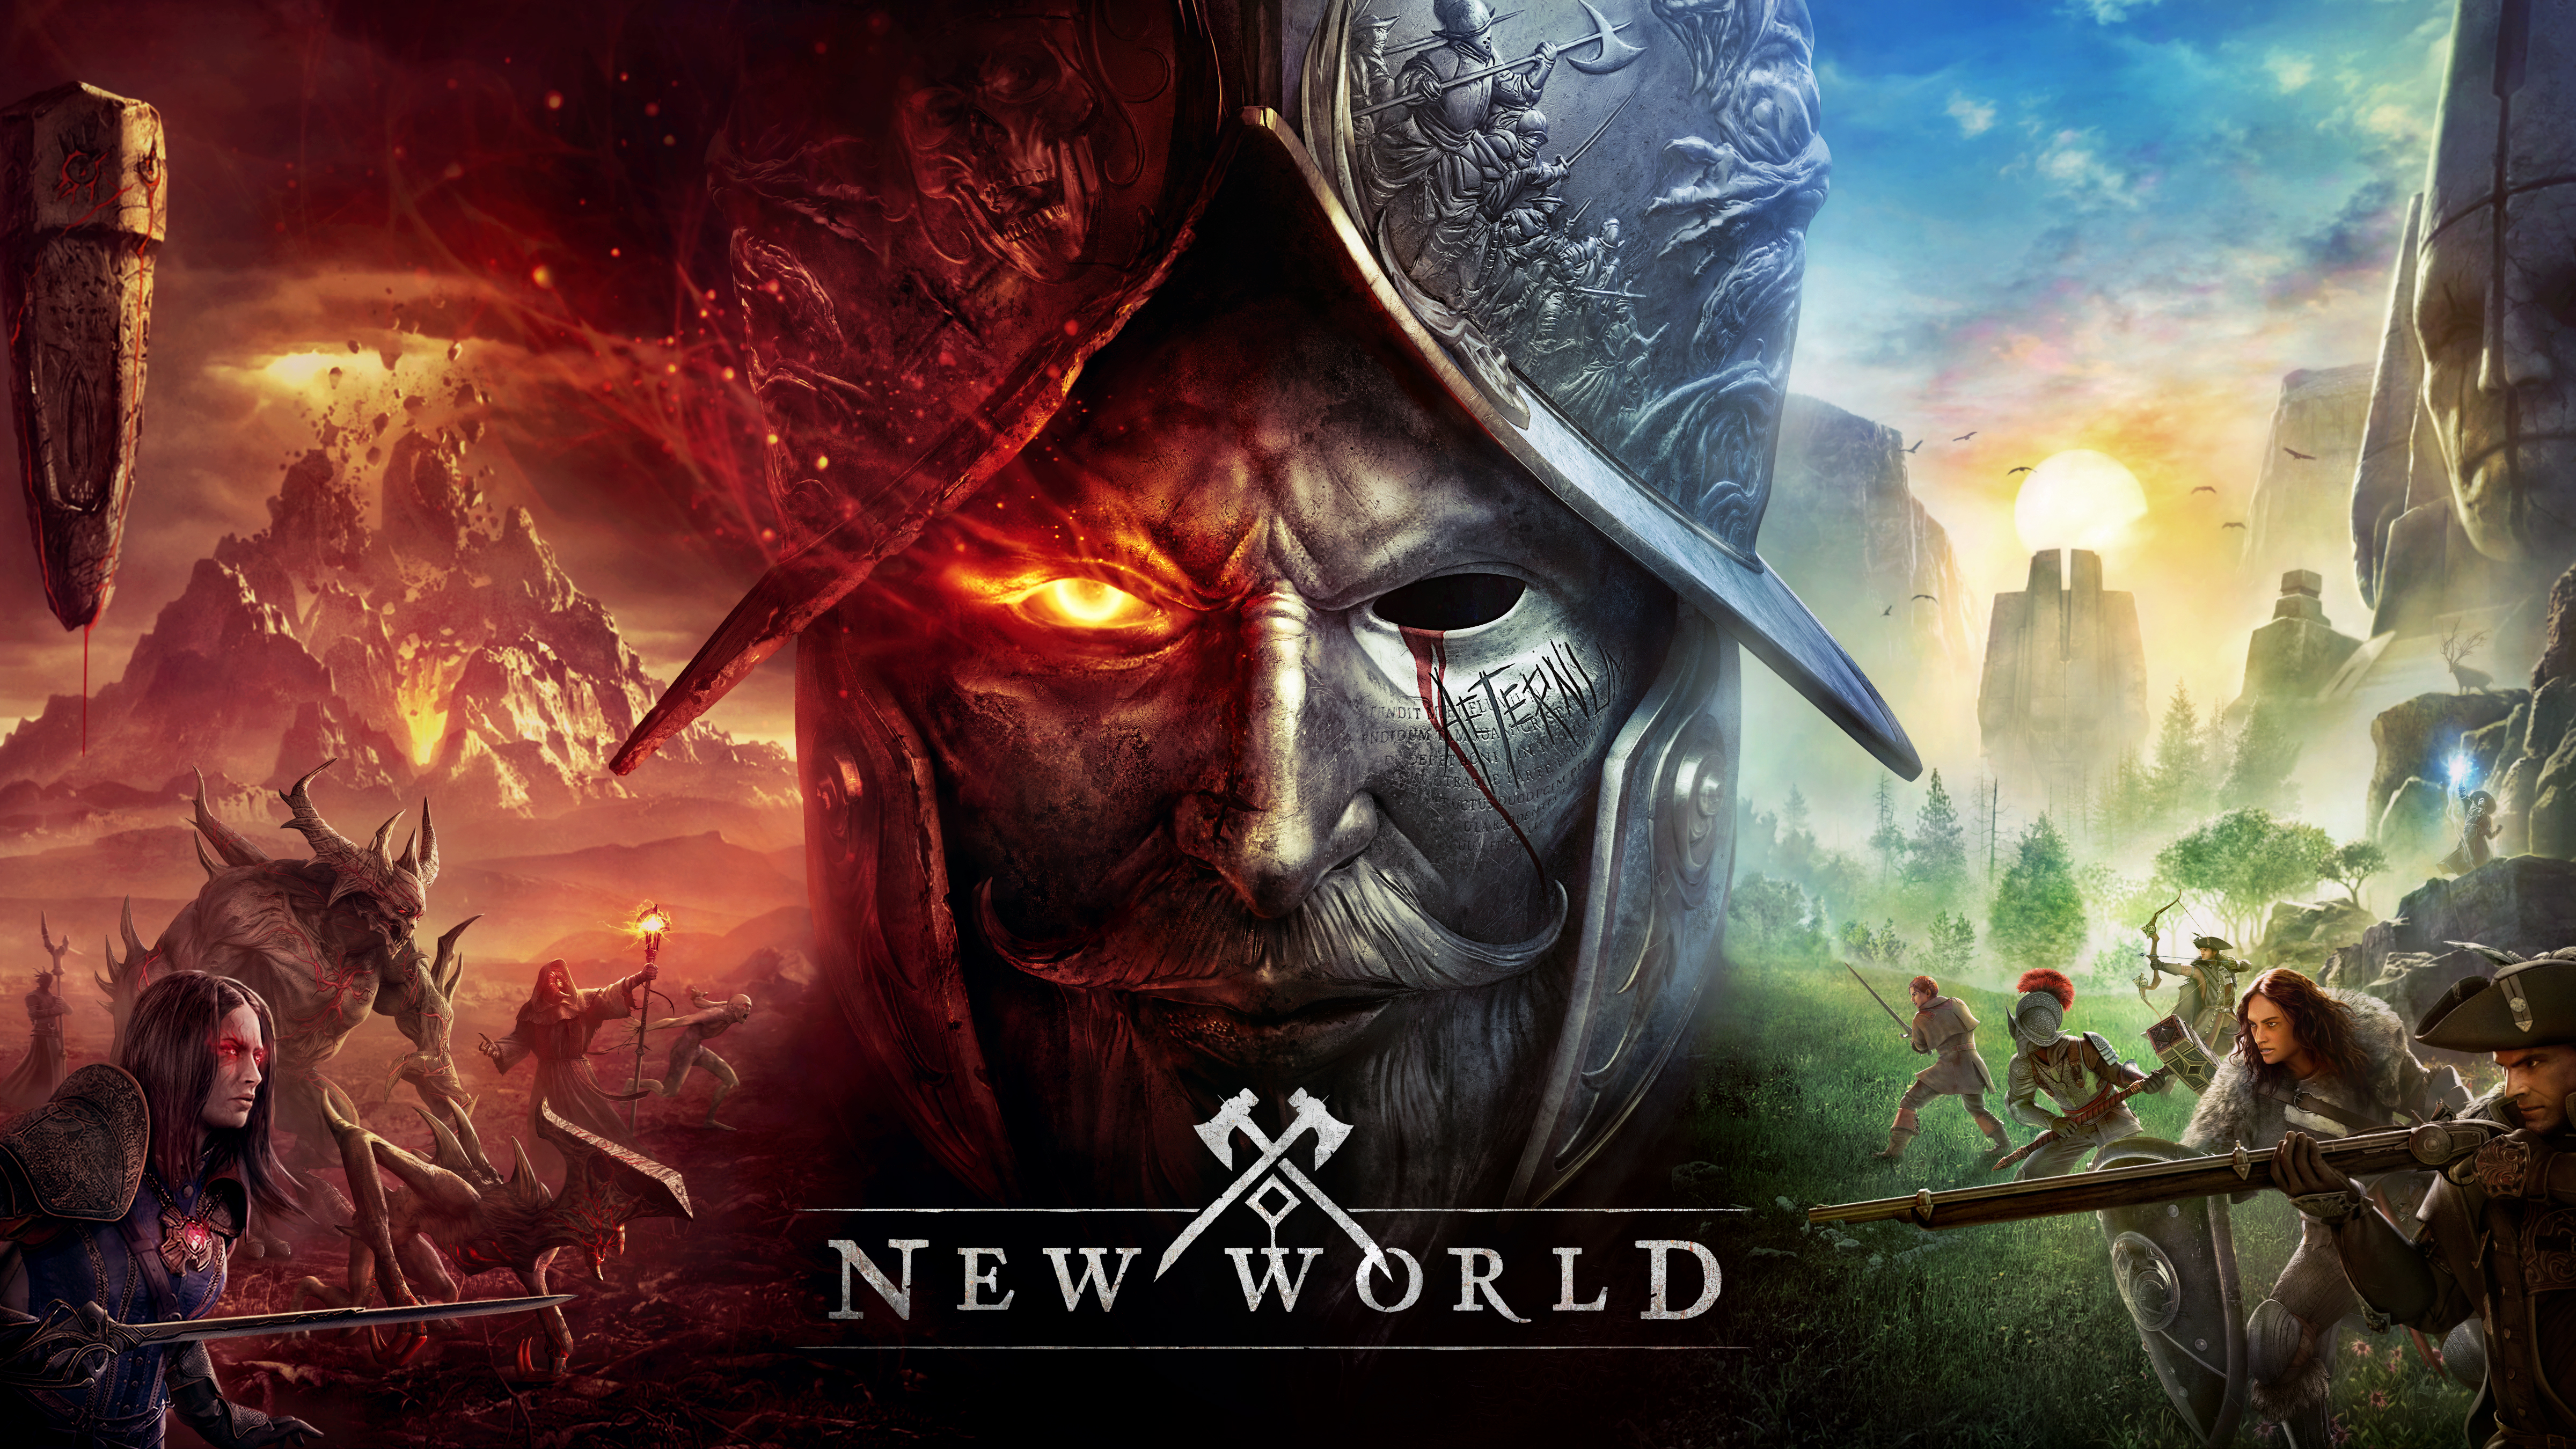 Grafika promująca New World